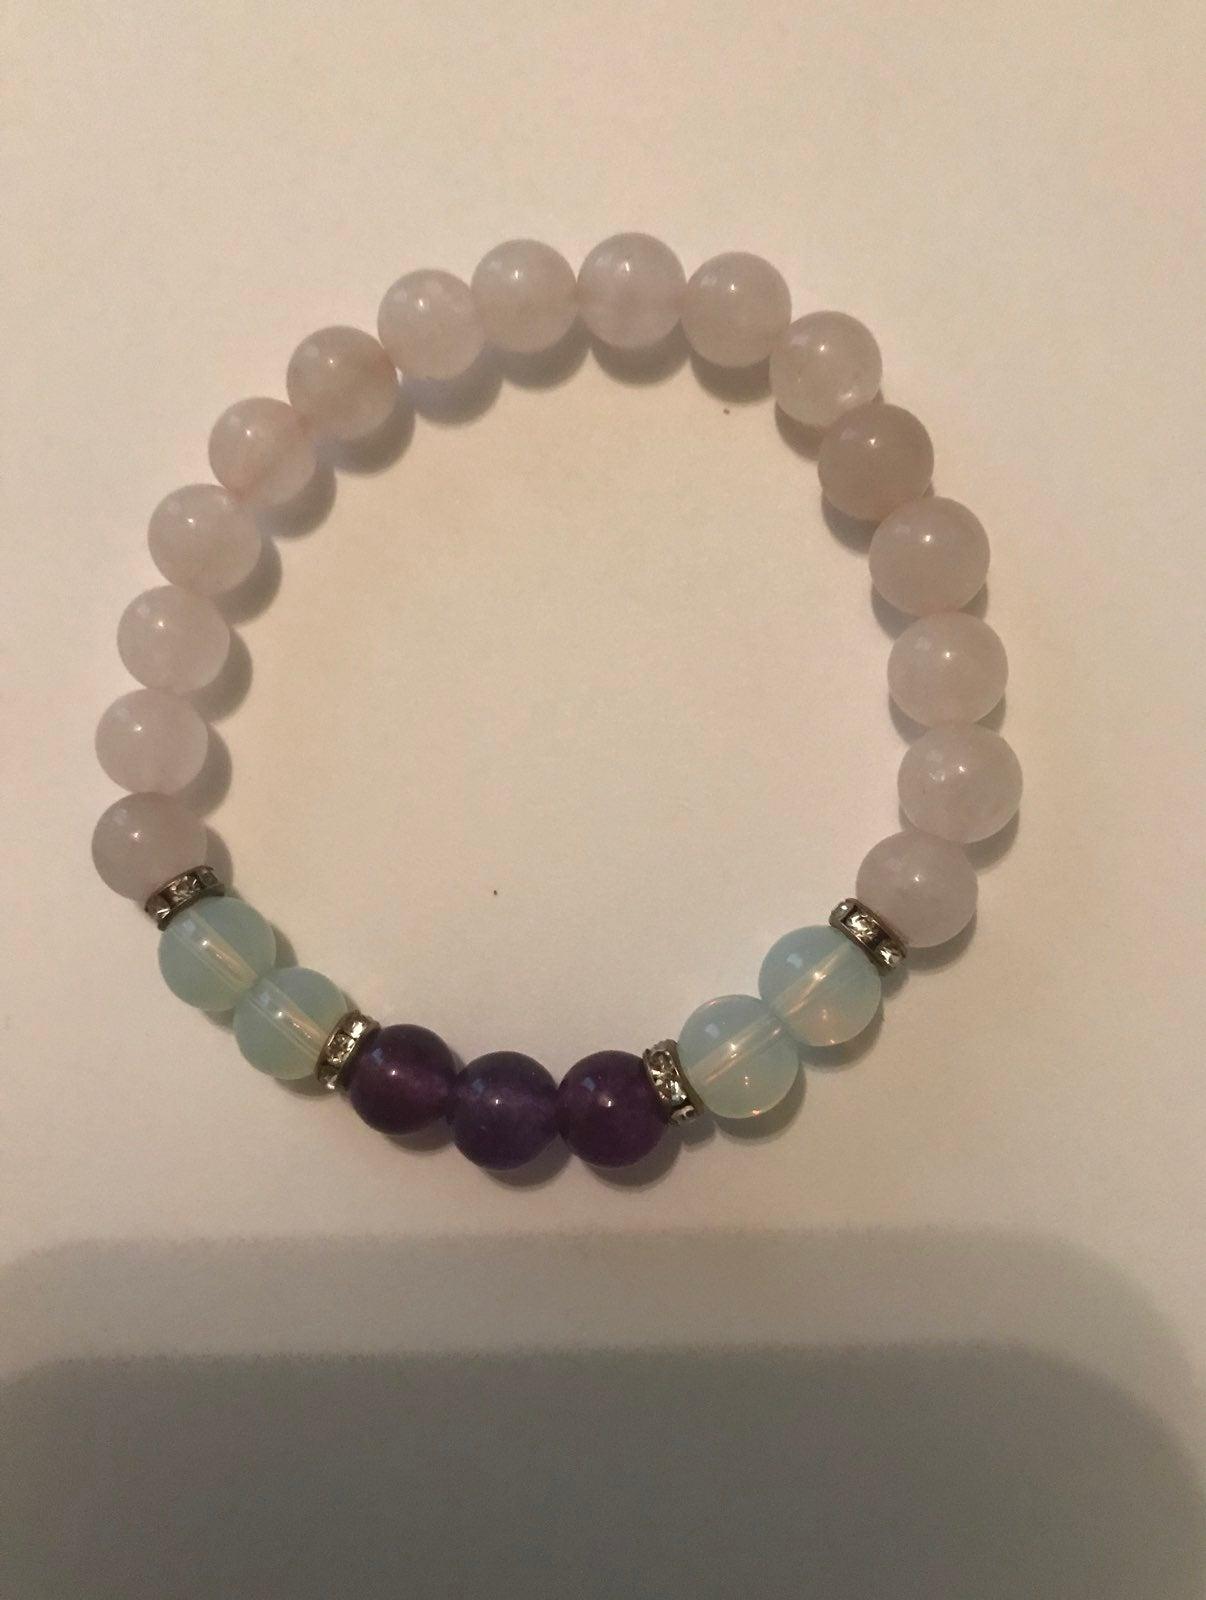 Rose quartz, moonstone And amethyst